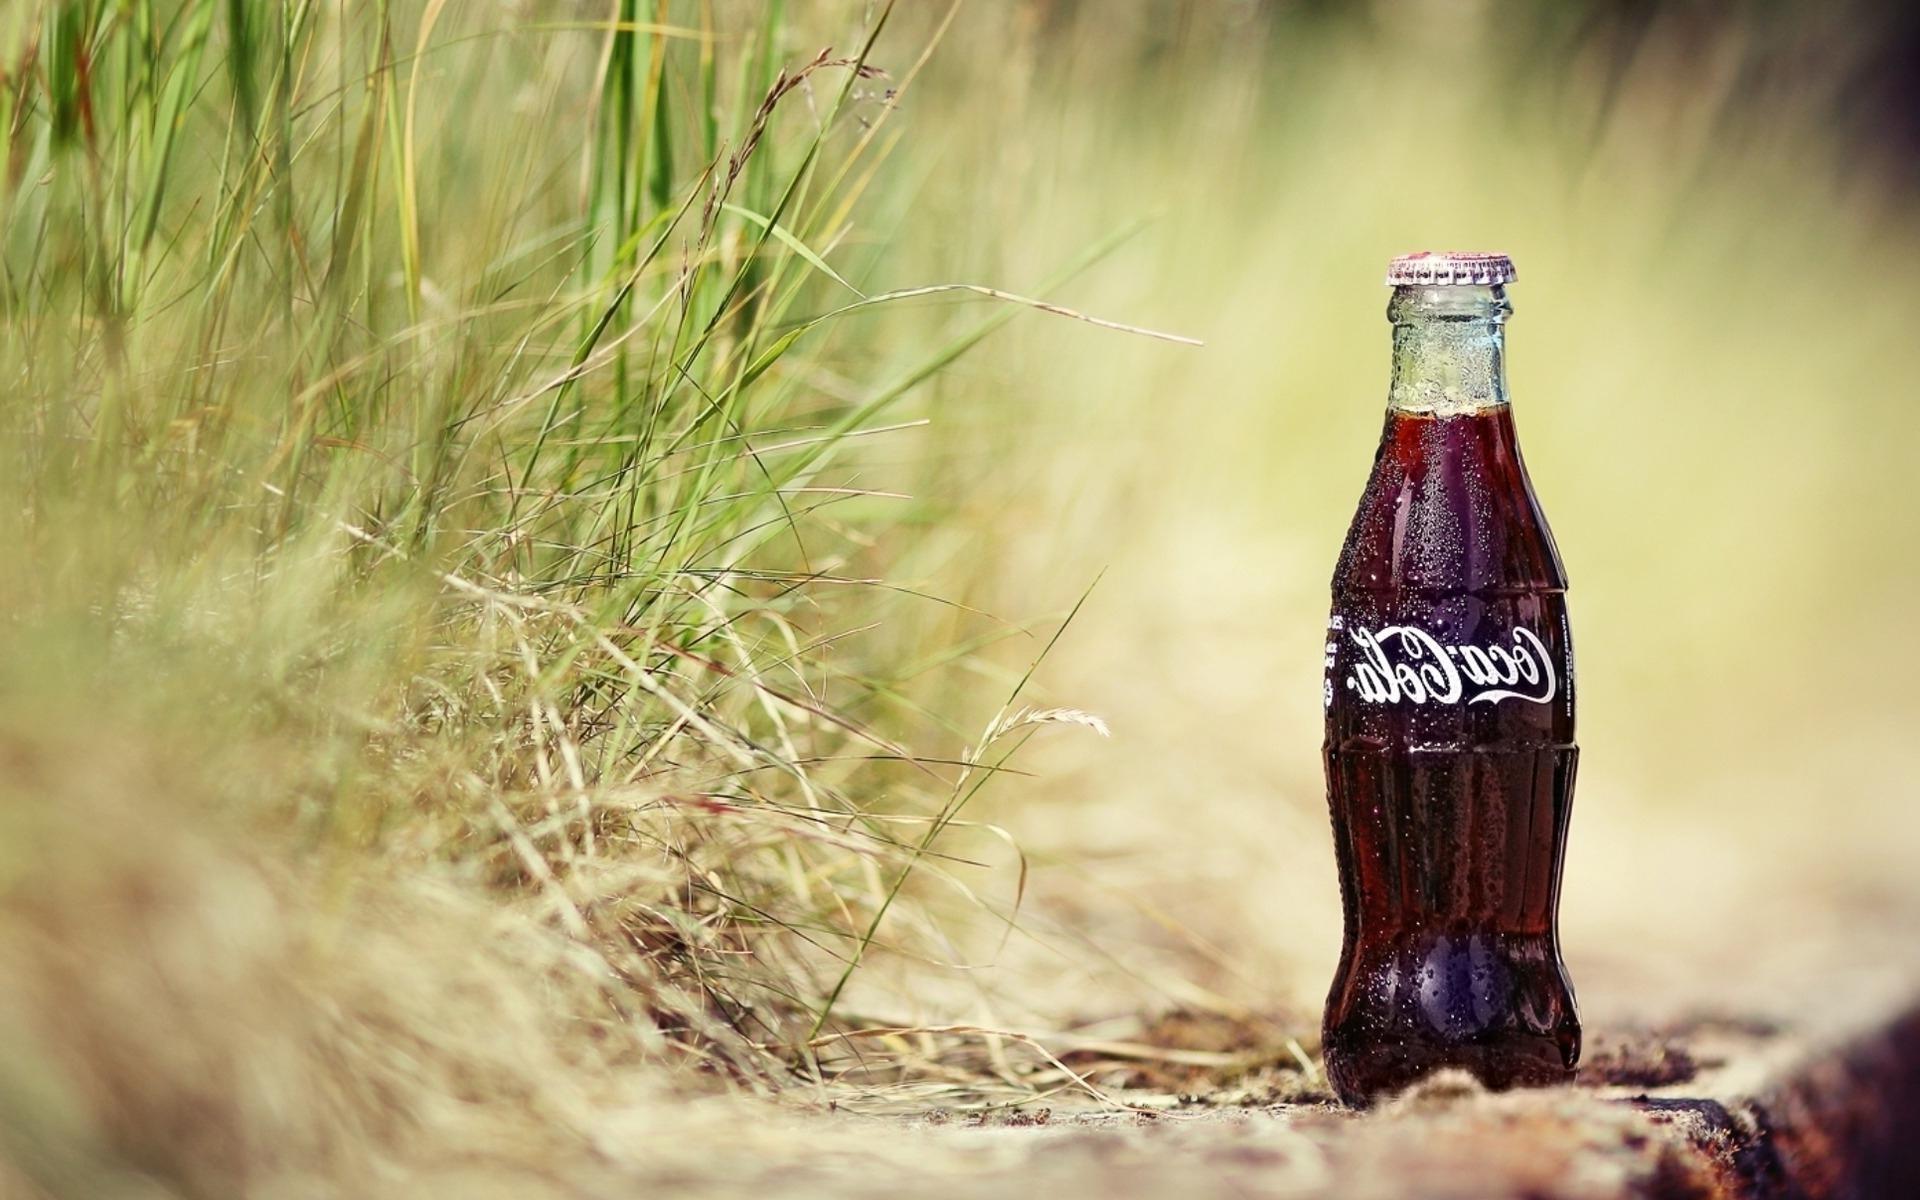 10 most popular coca cola bottle wallpaper full hd 1080p - Most popular hd wallpapers 1080p ...